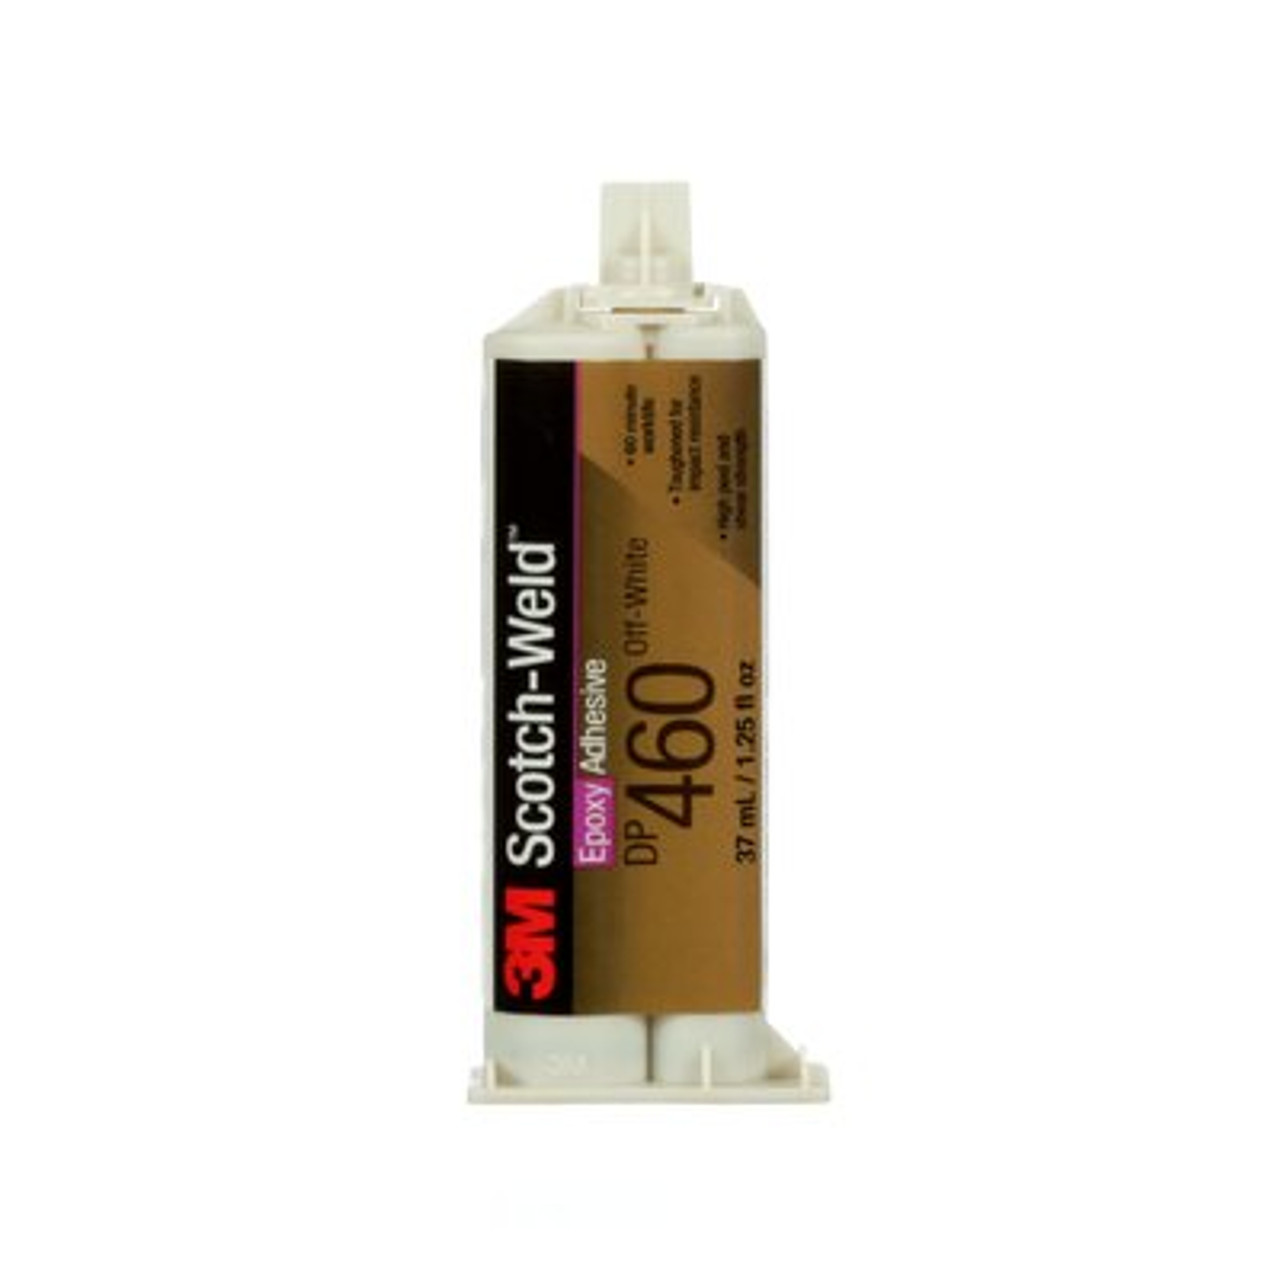 3M™ Scotch-Weld™ Epoxy Adhesive DP460 Off-White, 200 mL